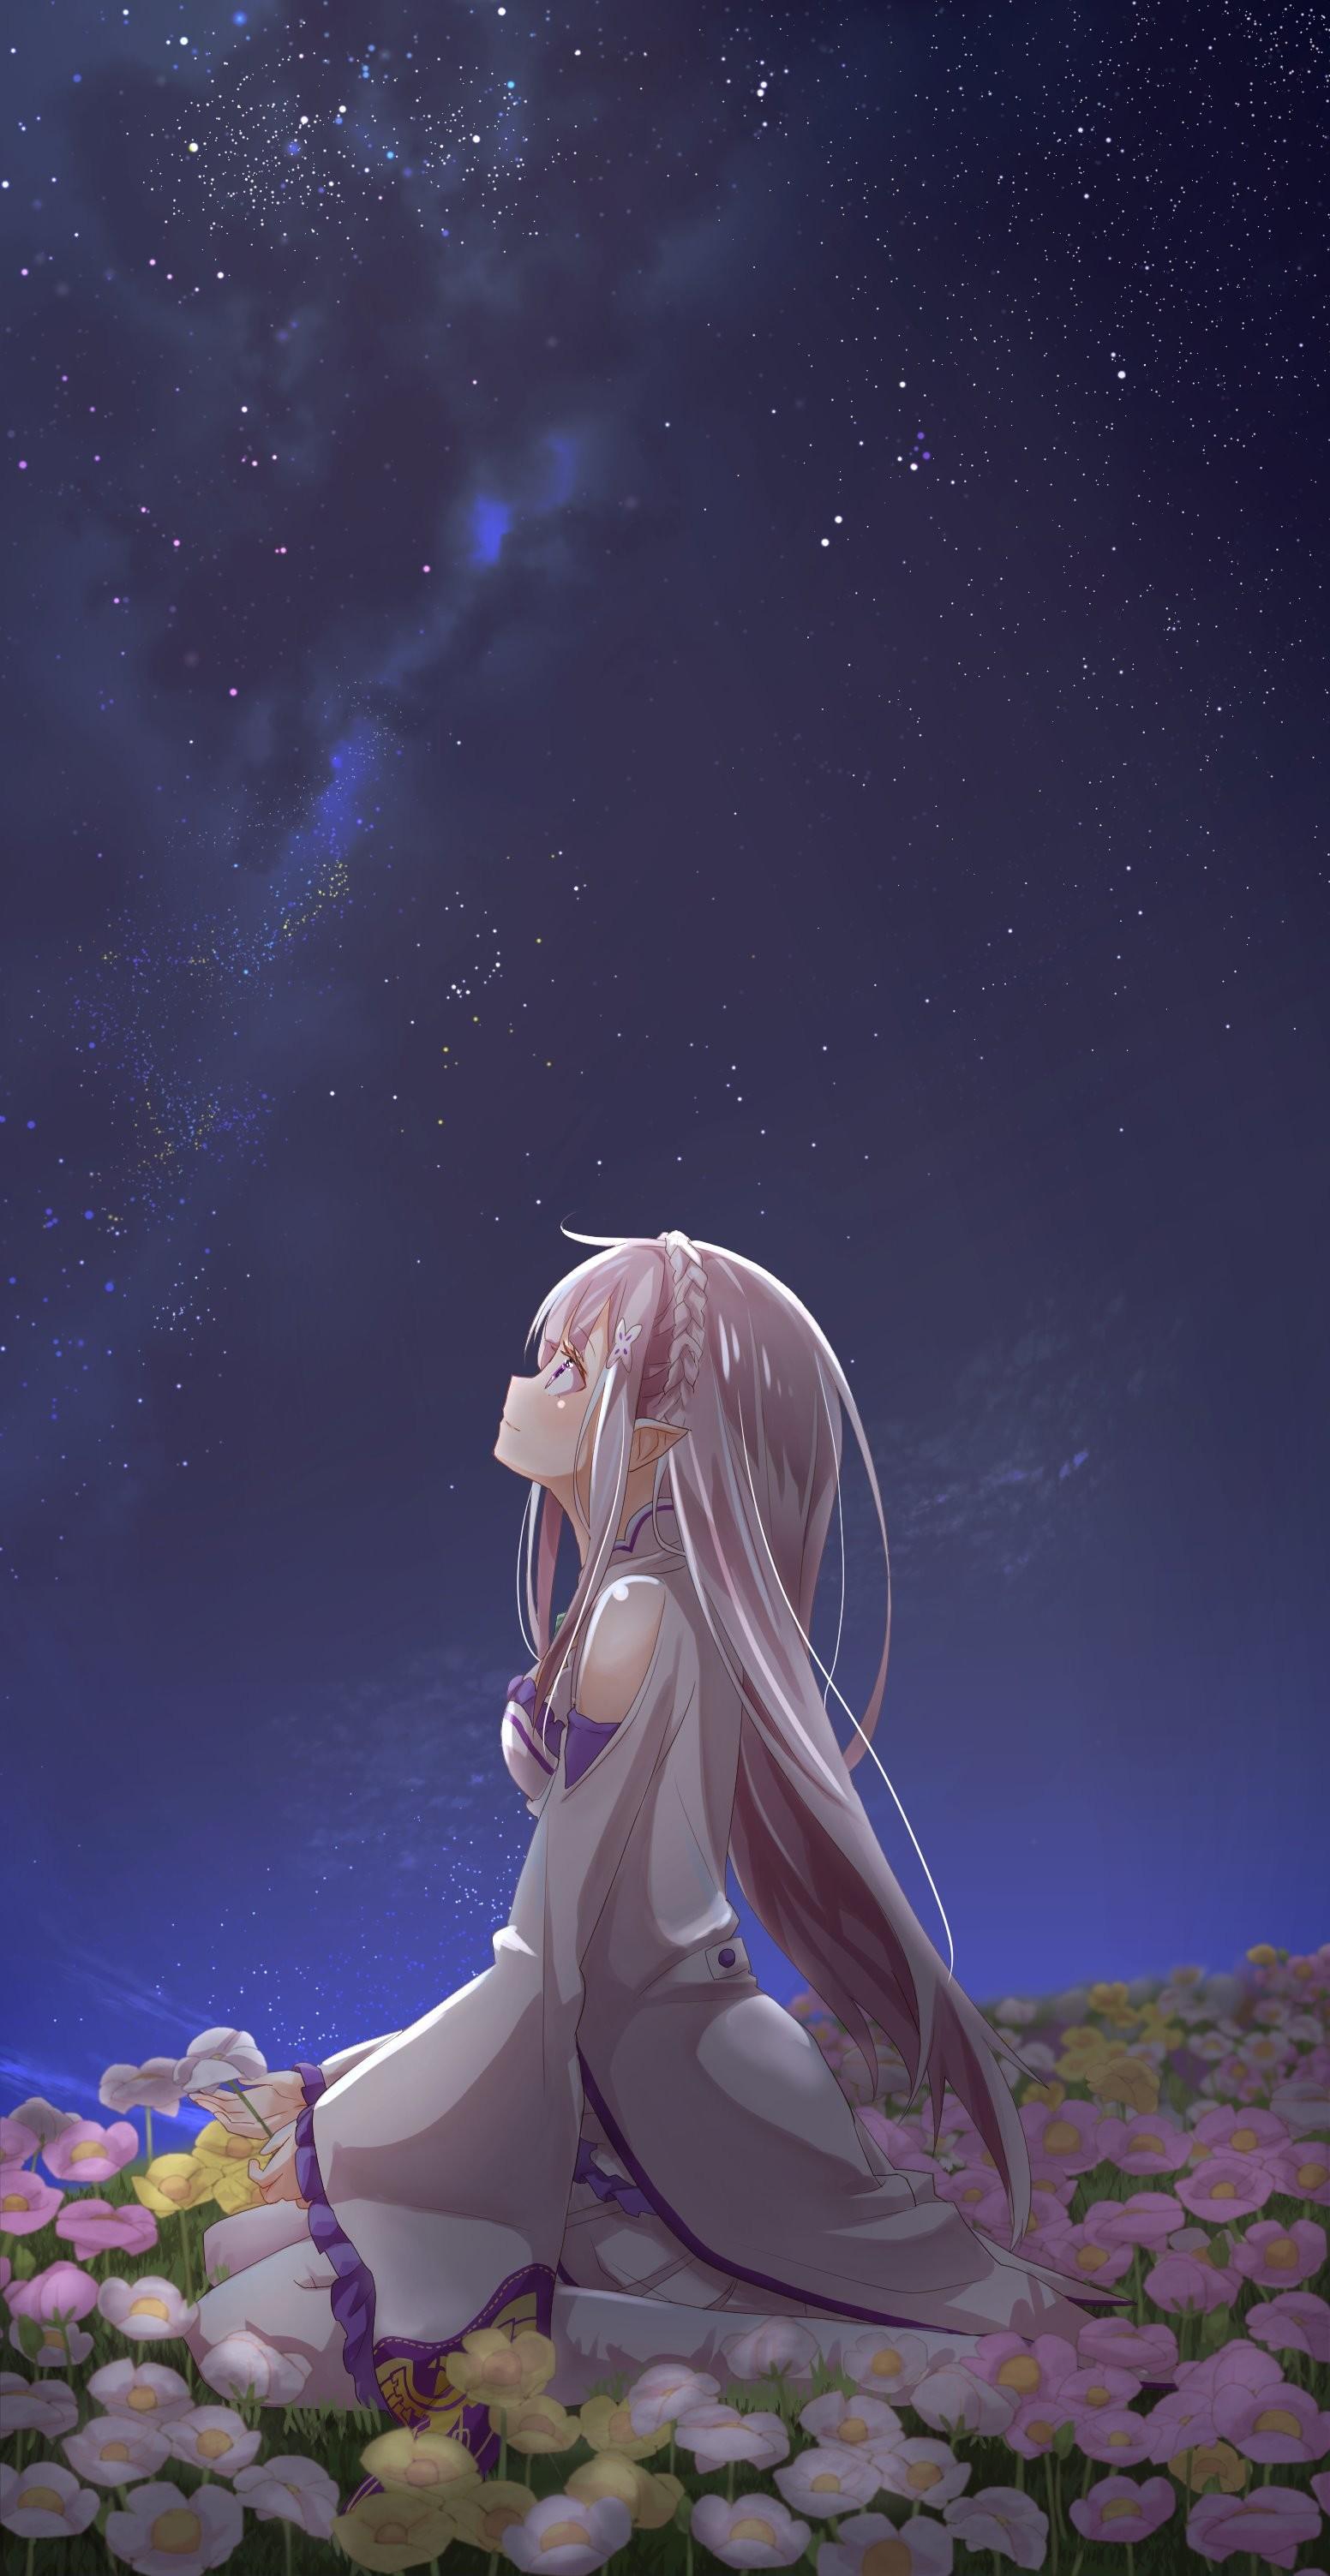 Anime wallpaper free wallpaper